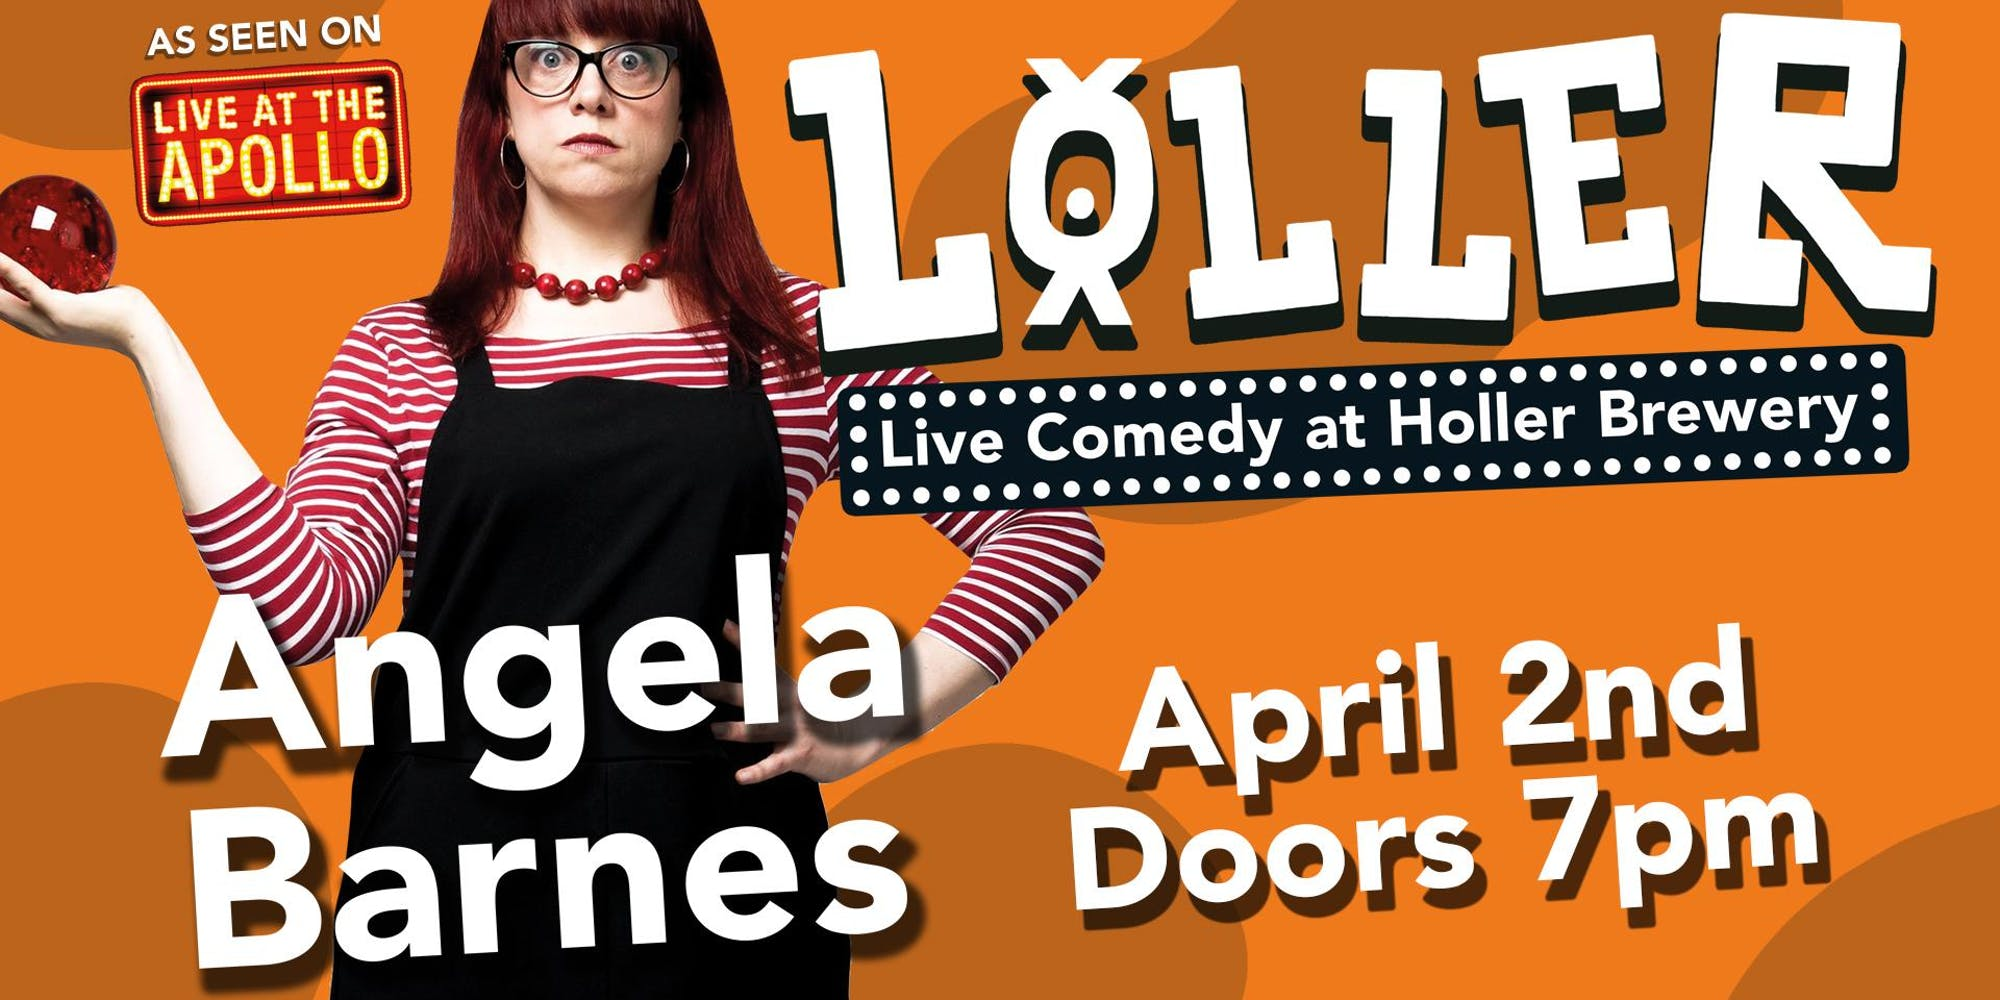 loller-comedy-brighton-april-holler-brewery.jpg